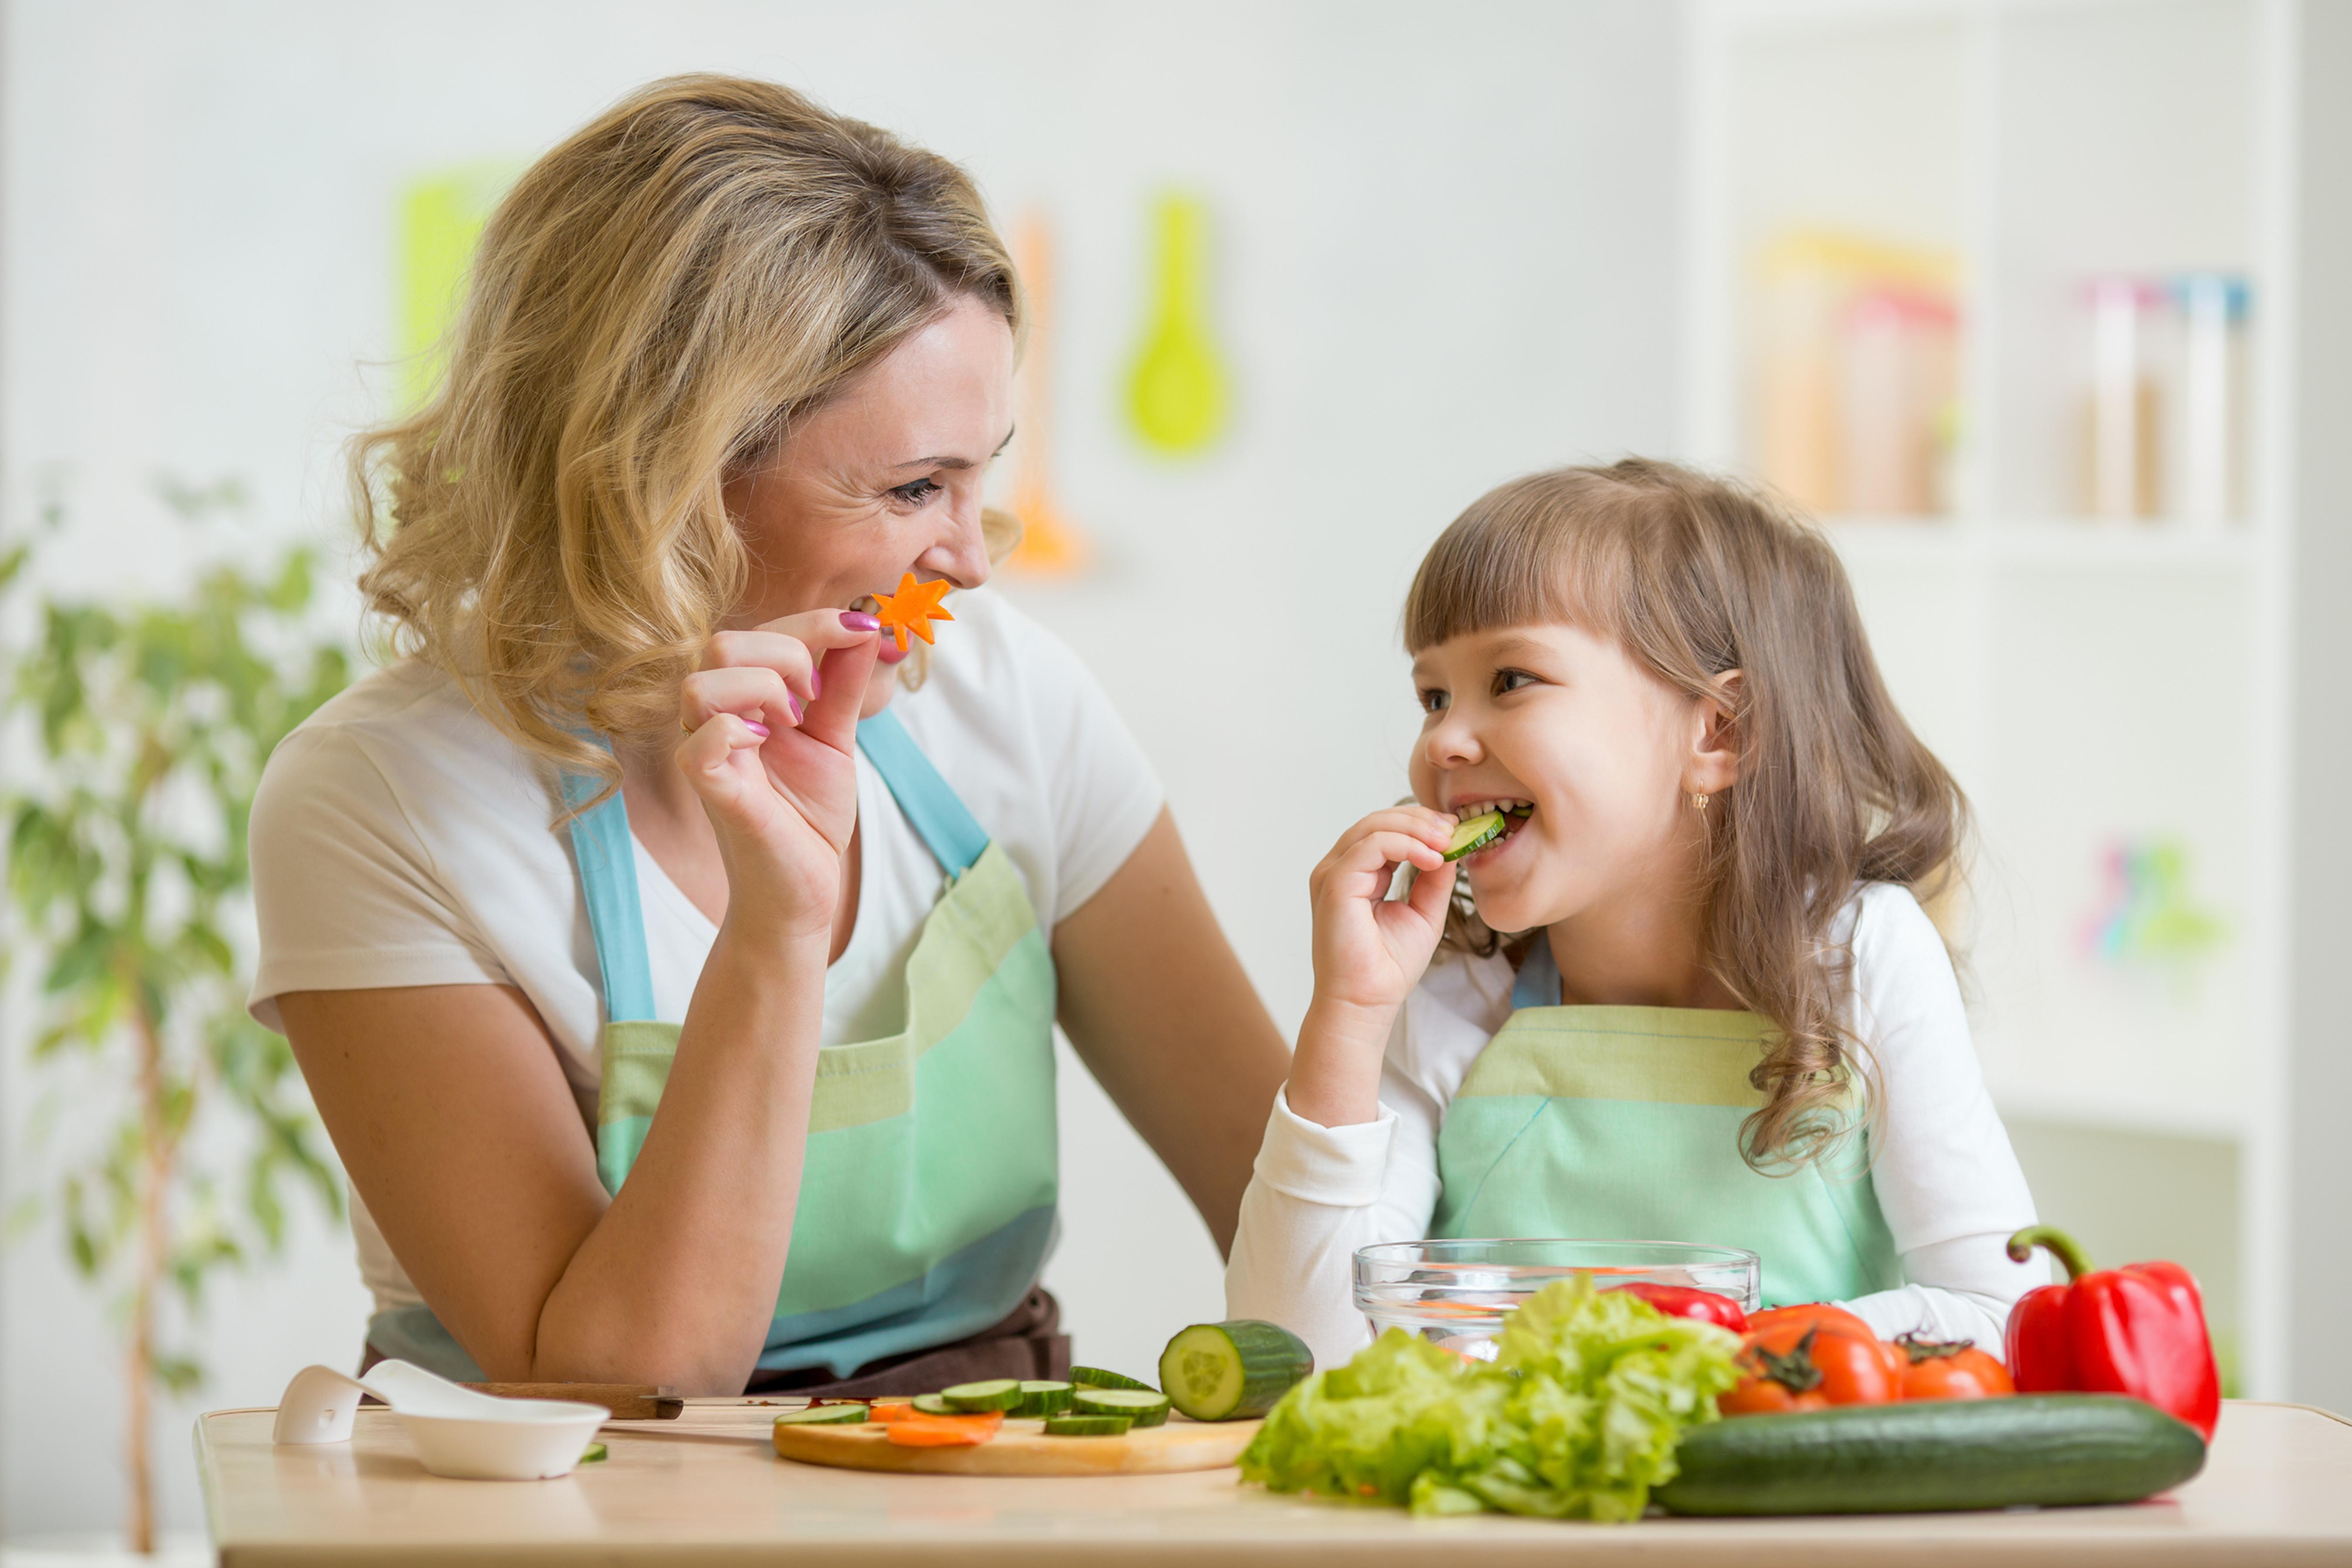 Dieta no cariogénica adaptada a niños